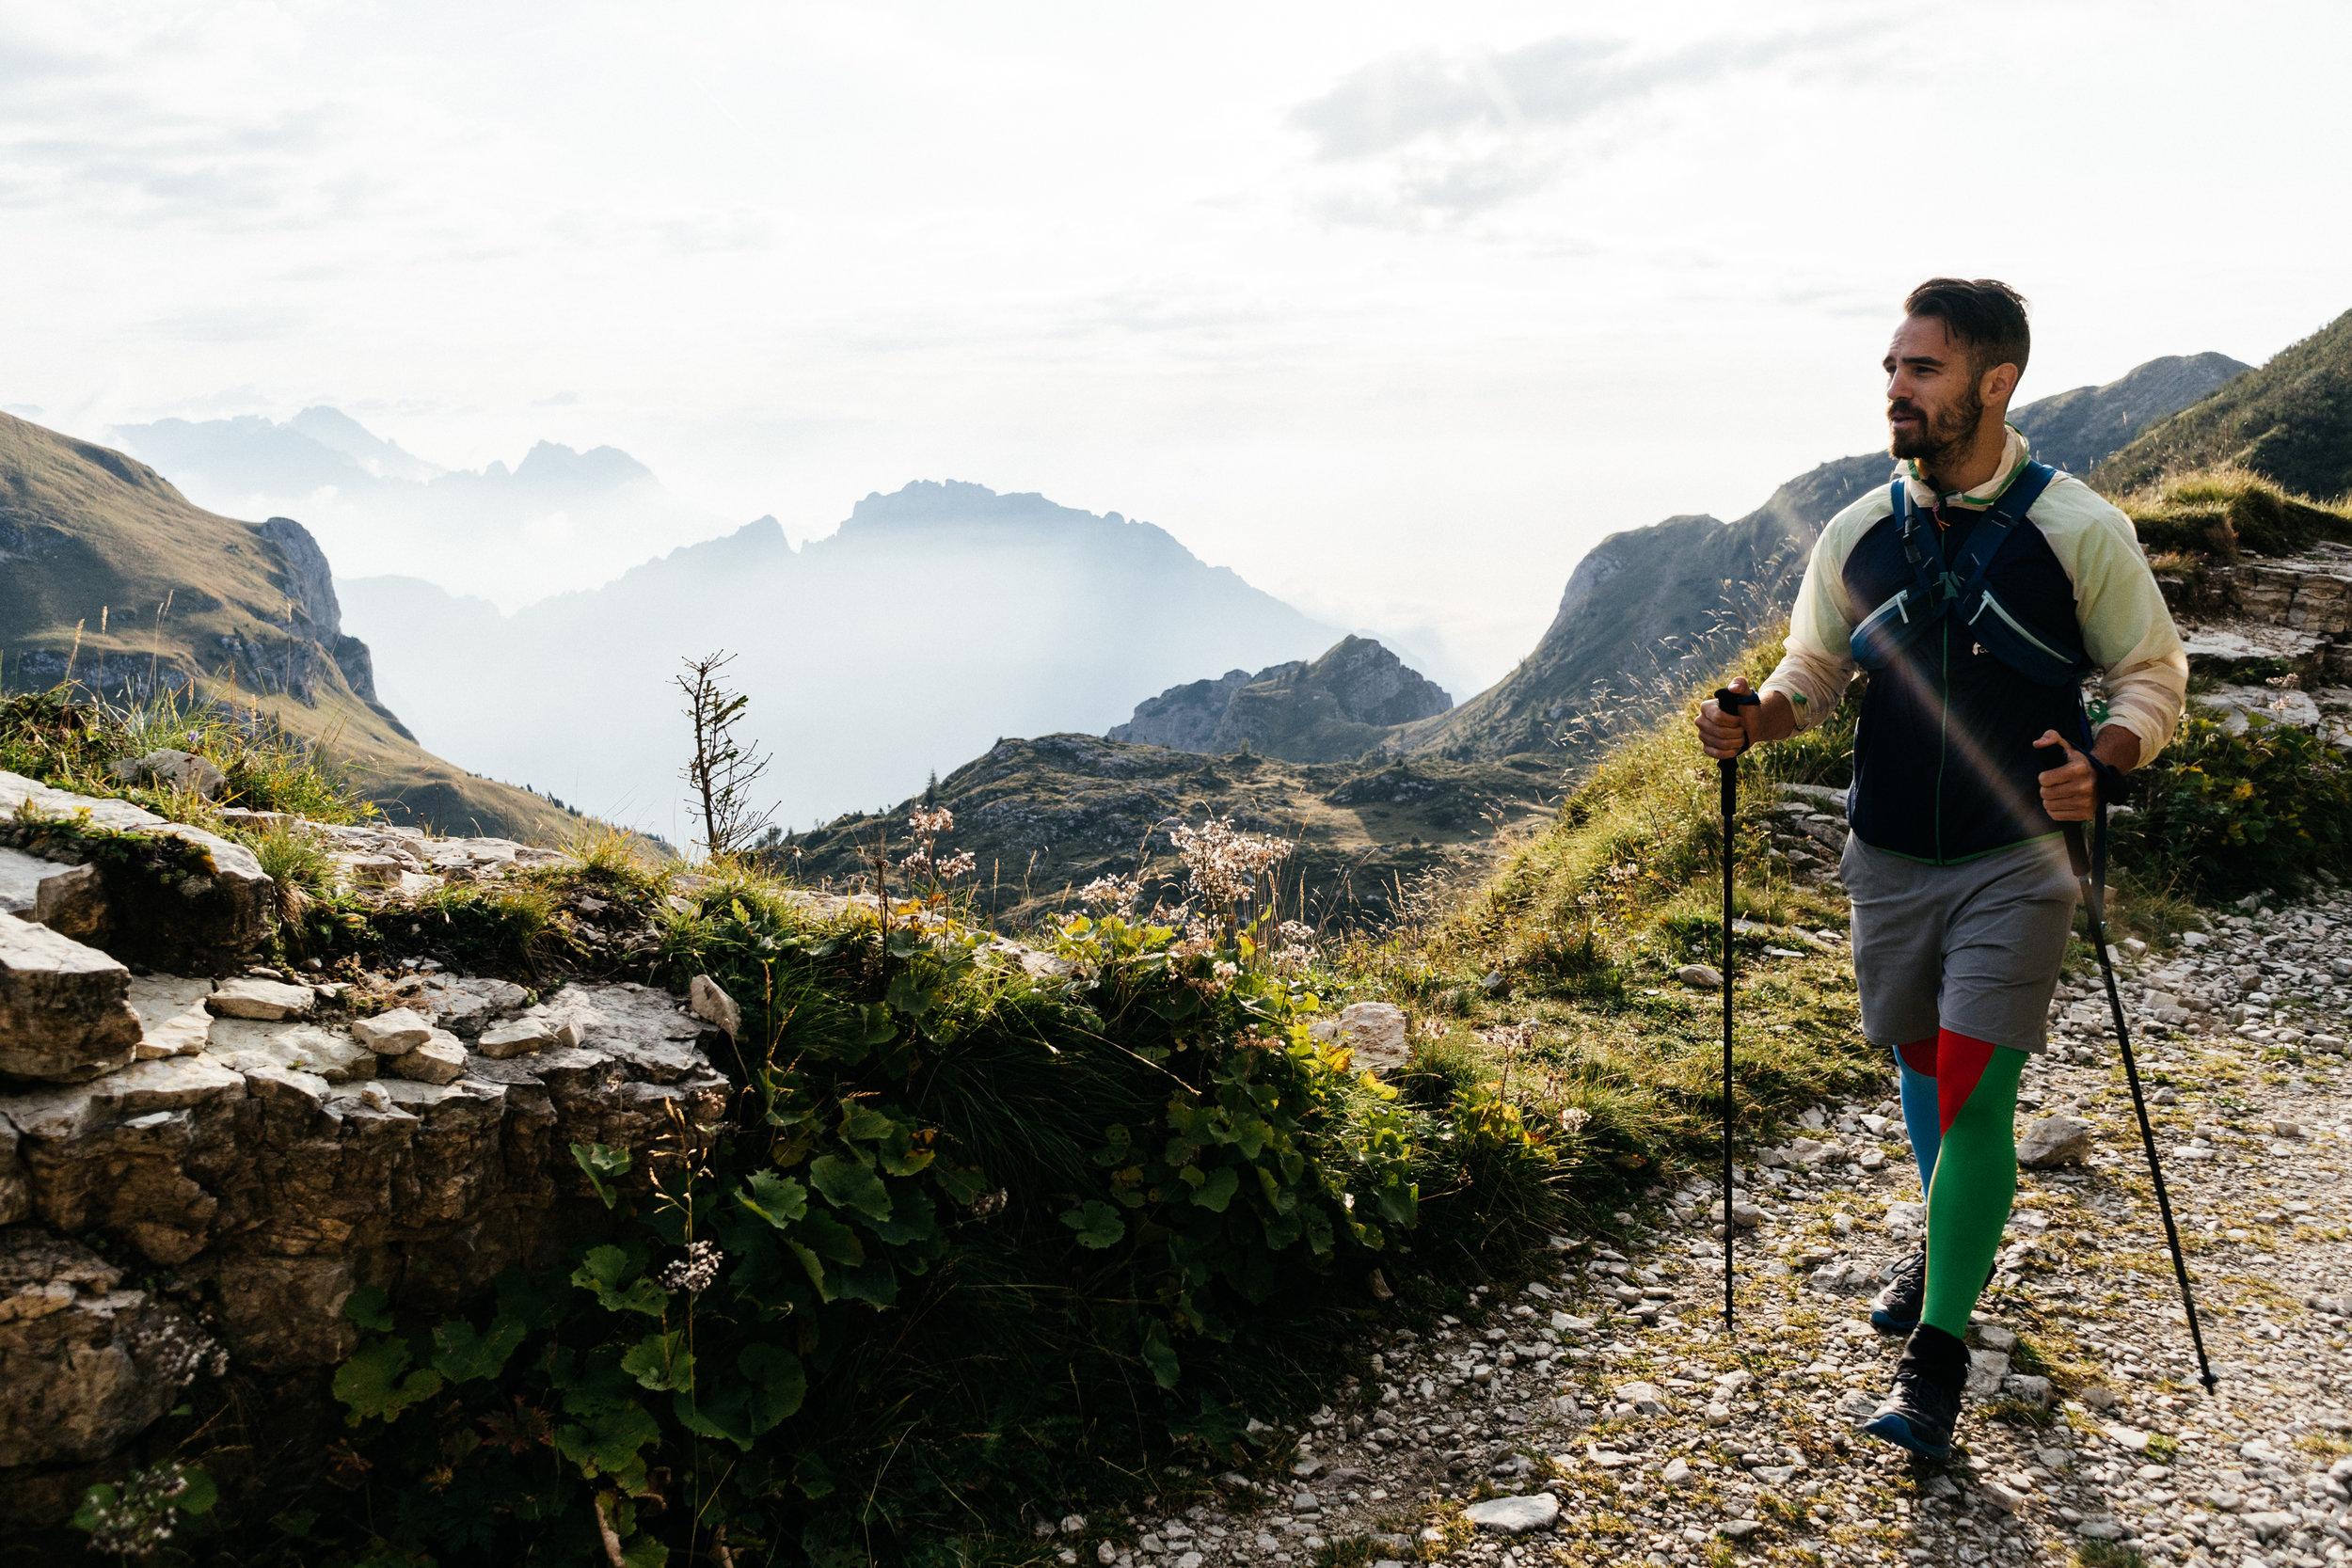 Dolomites-ChrisBrinleeJr-SEP17-1.jpg